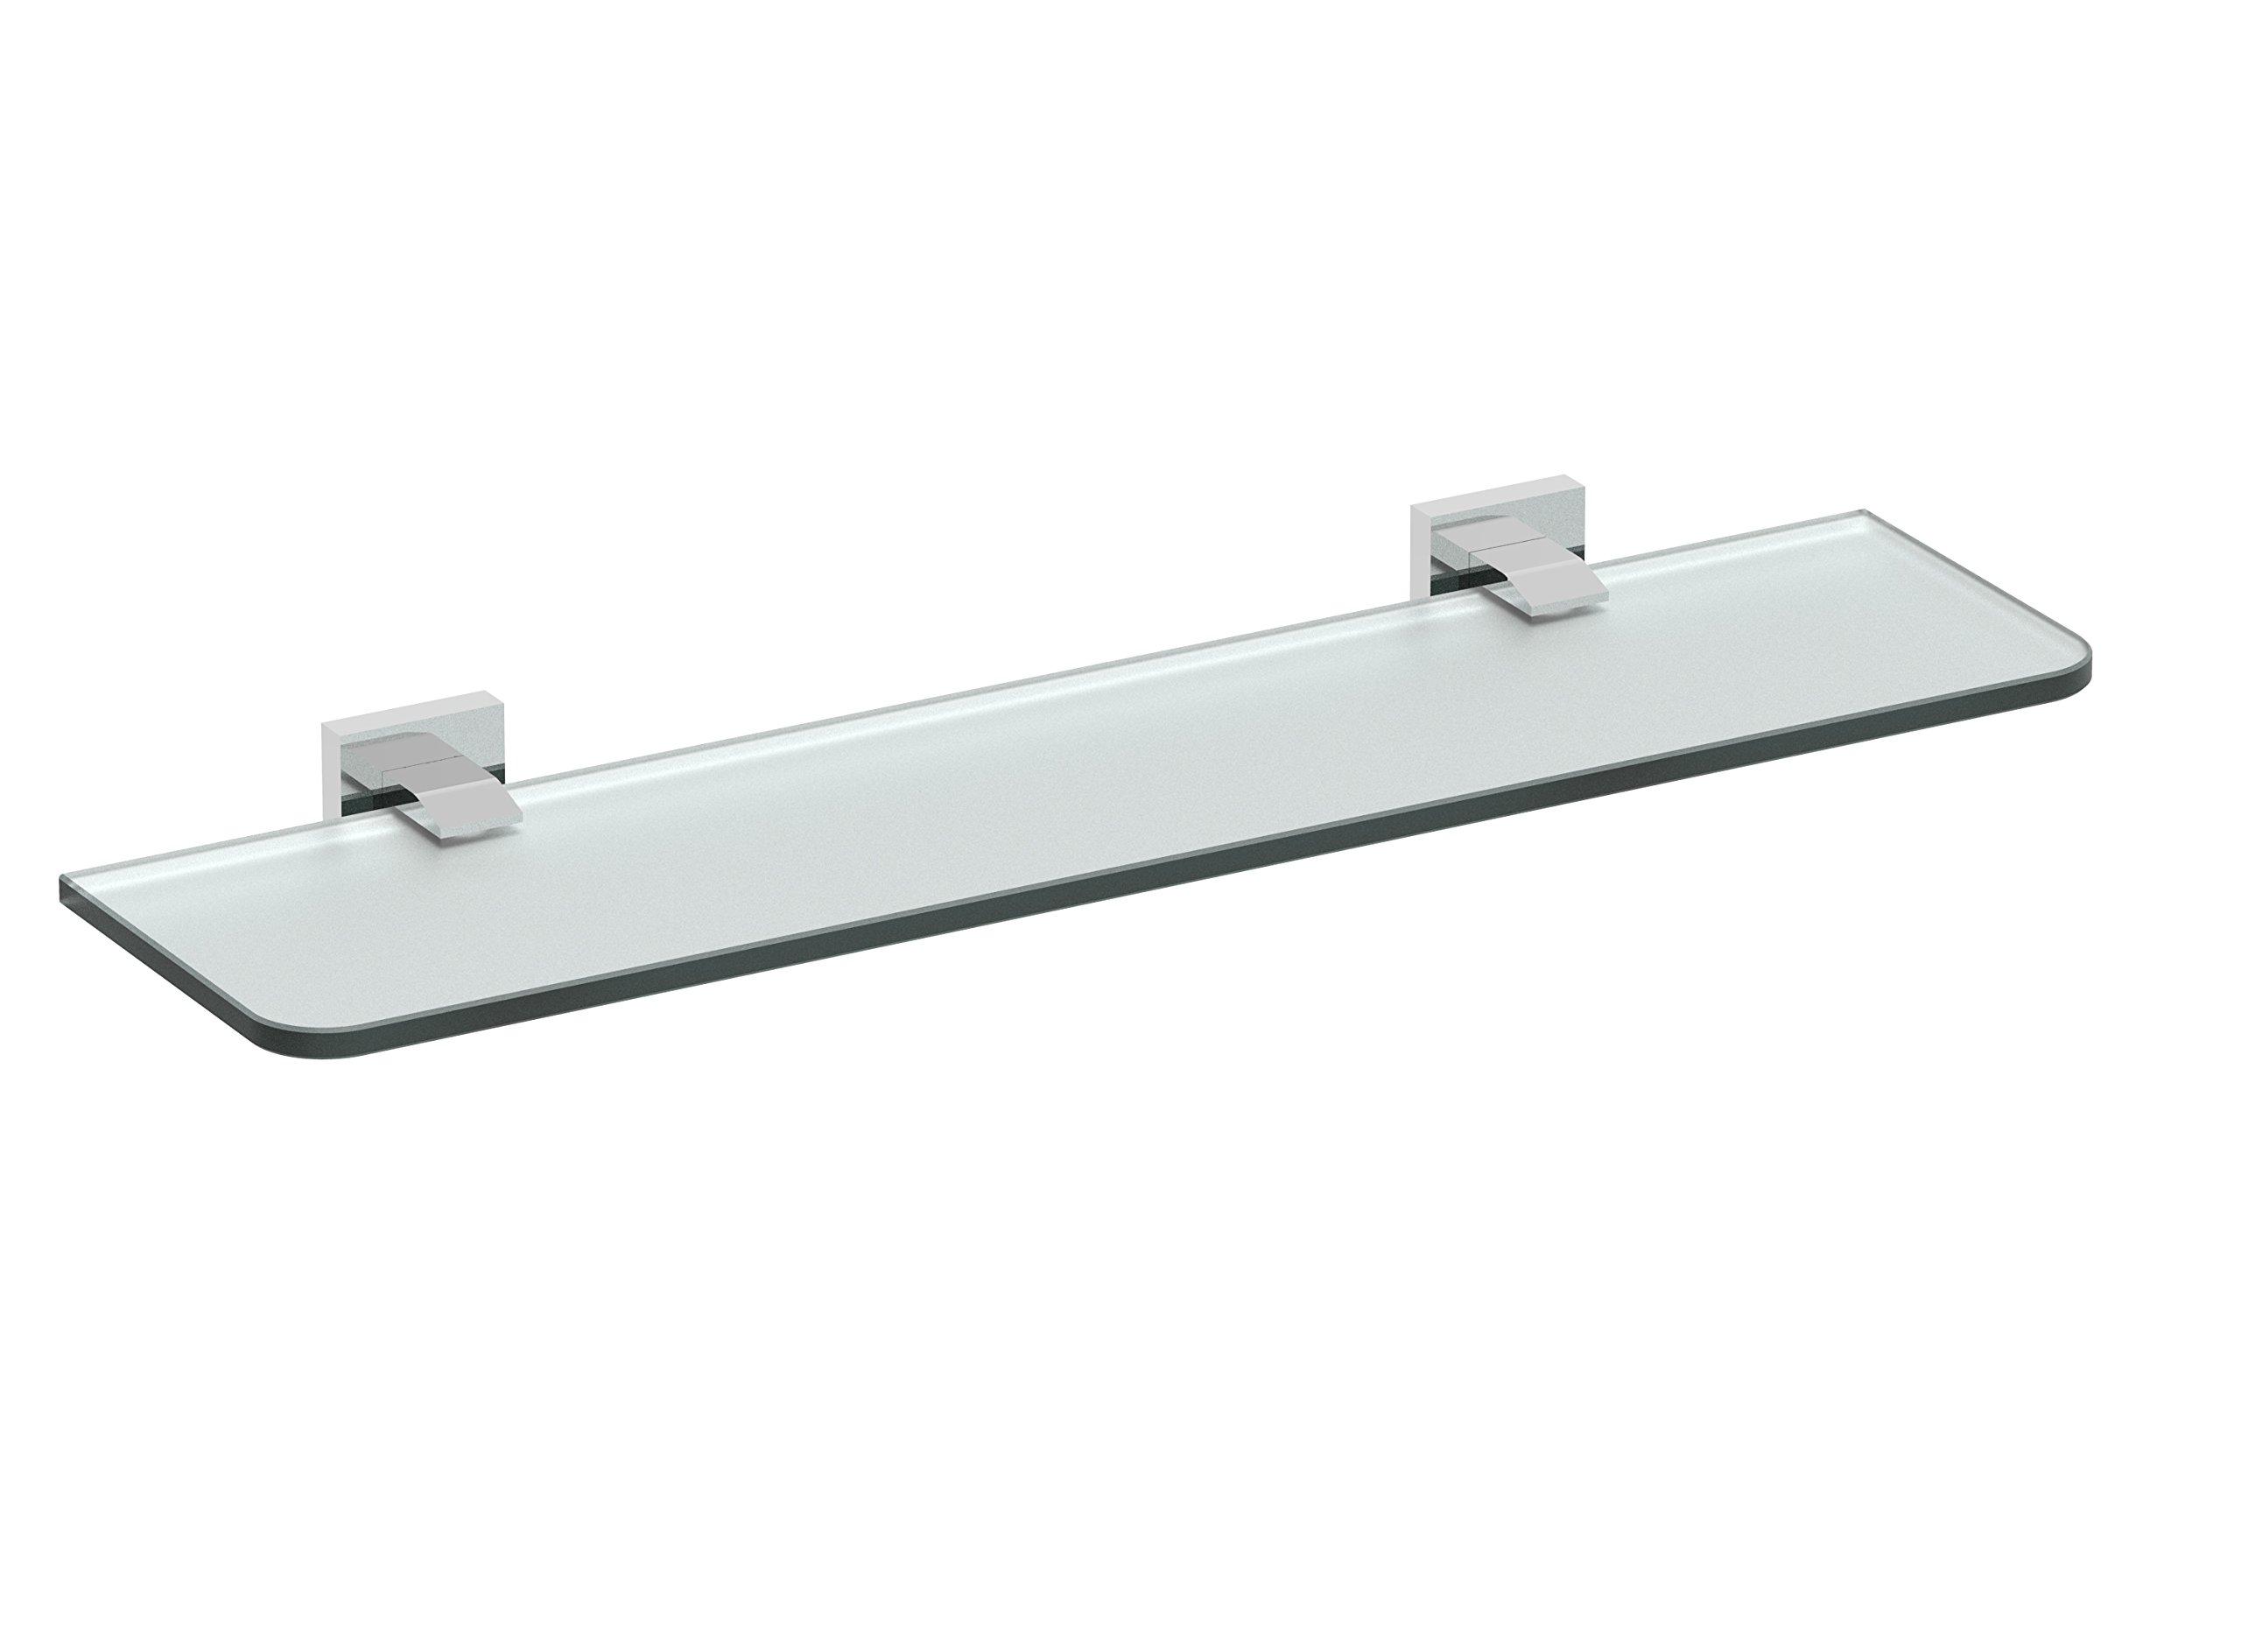 Eviva EVAC80BN Klim Glass Shelf Wall Mount (Brushed Nickel) Bathroom Accessories Combination